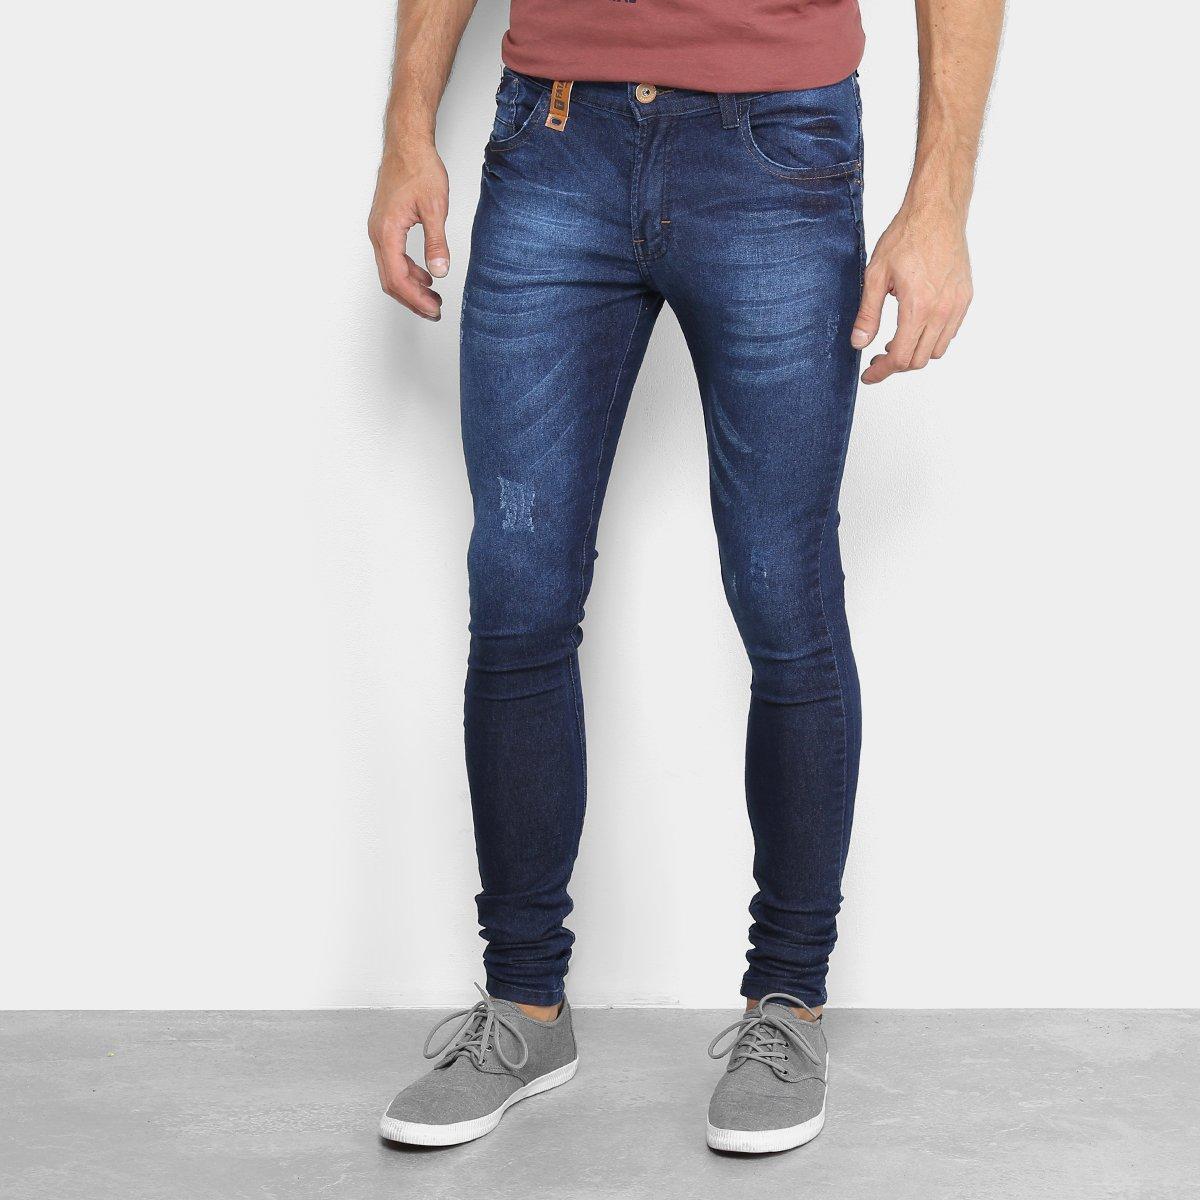 99108768b Calça Jeans Skinny Fatal Estonada Masculina - Jeans - Compre Agora ...